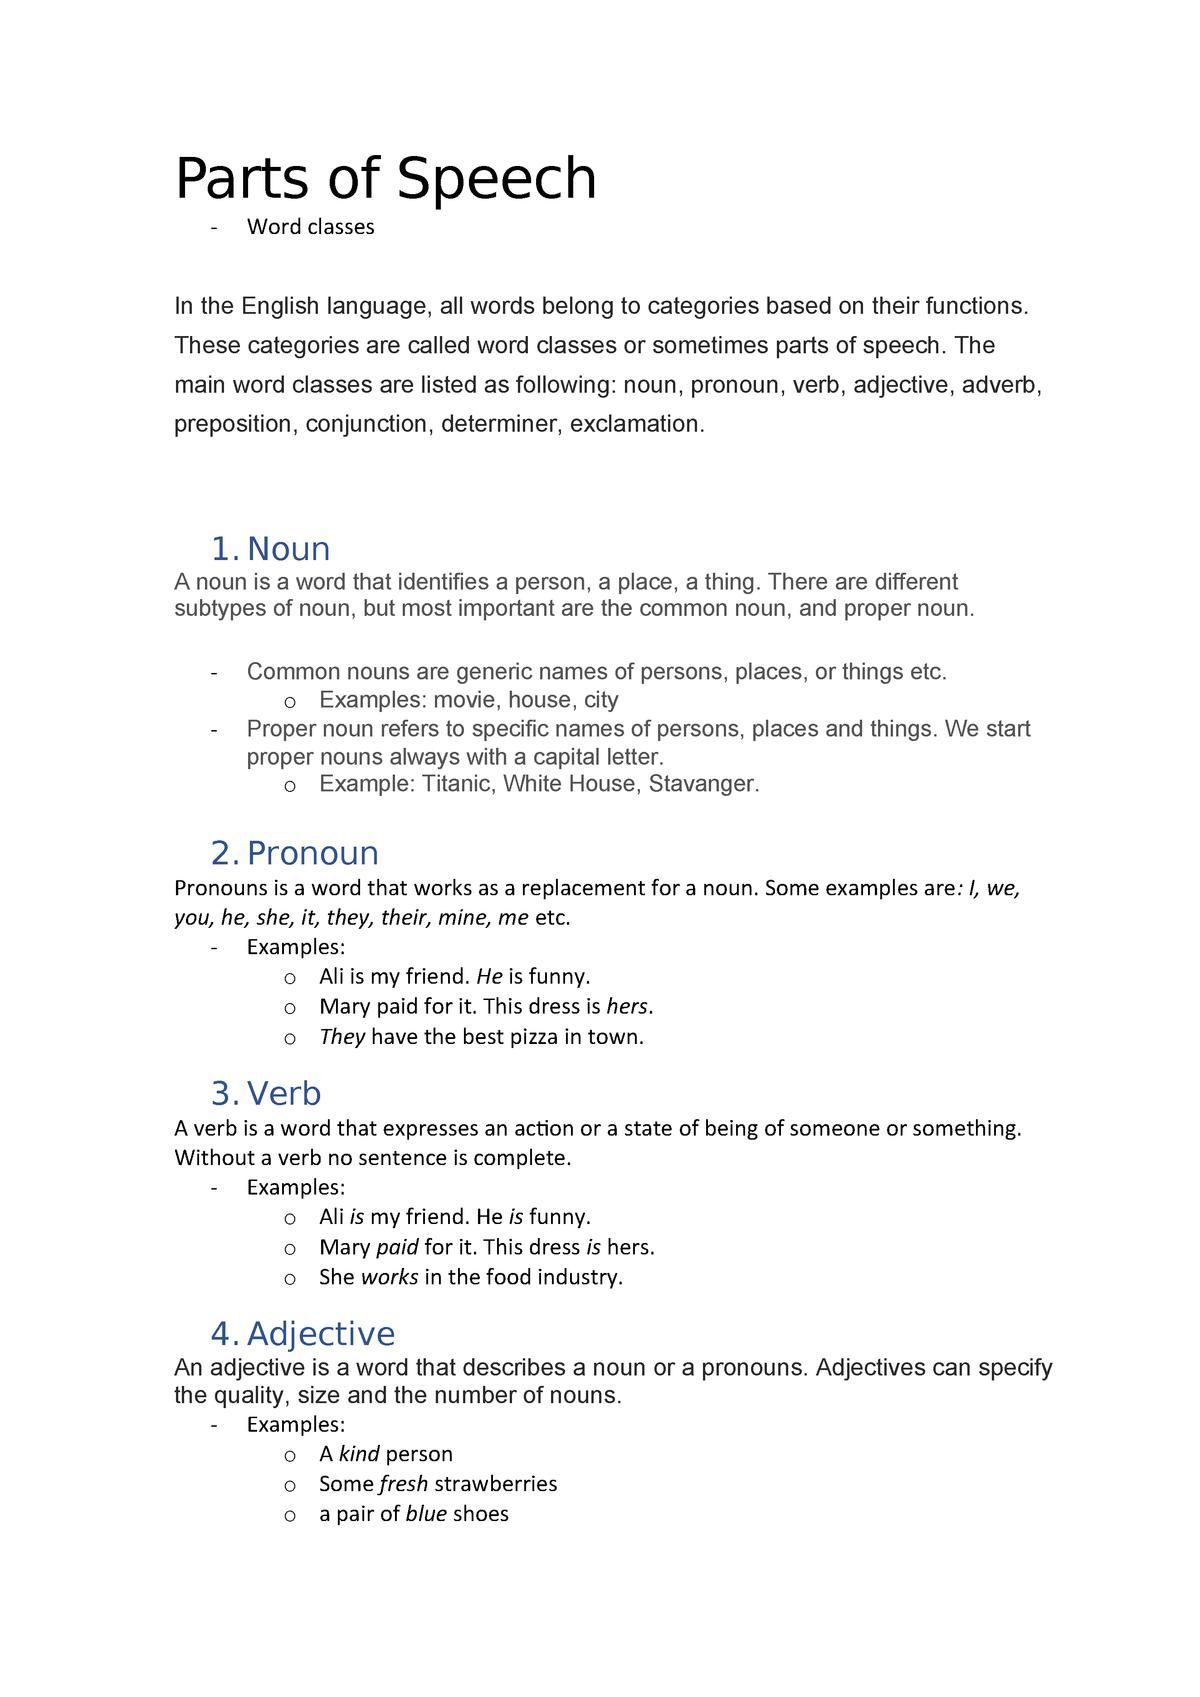 Word classes - Parts of speech - ENG1100 - UiO - StuDocu